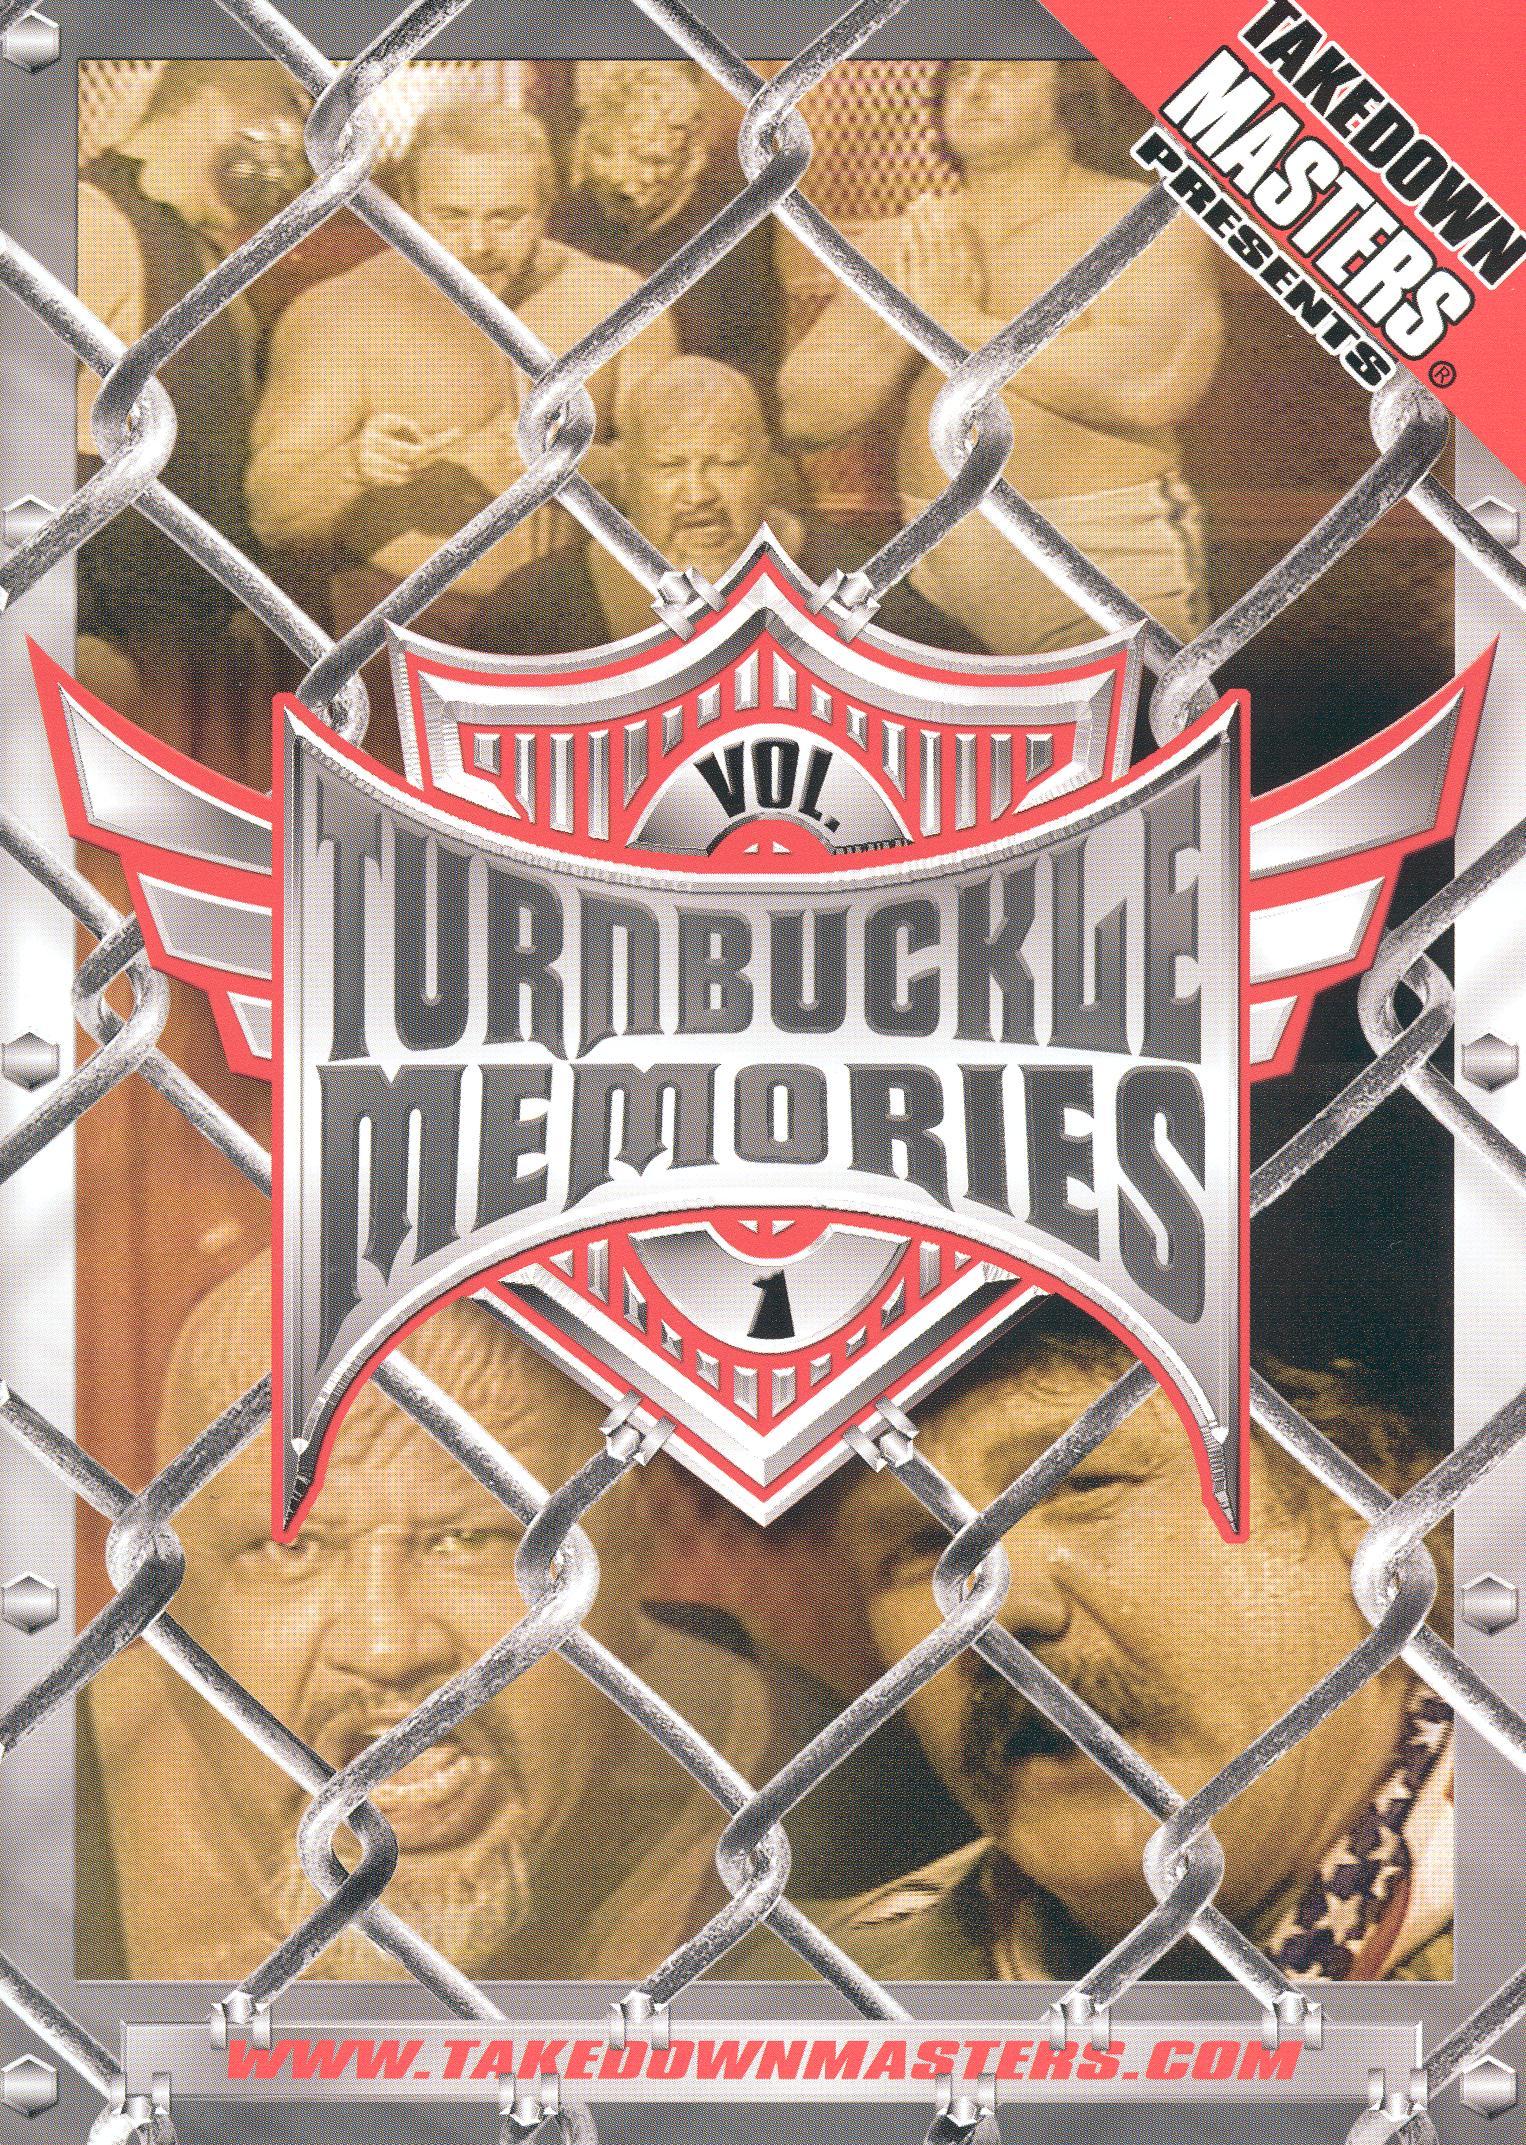 Takedown Masters: Turnbuckle Memories, Vol. 1